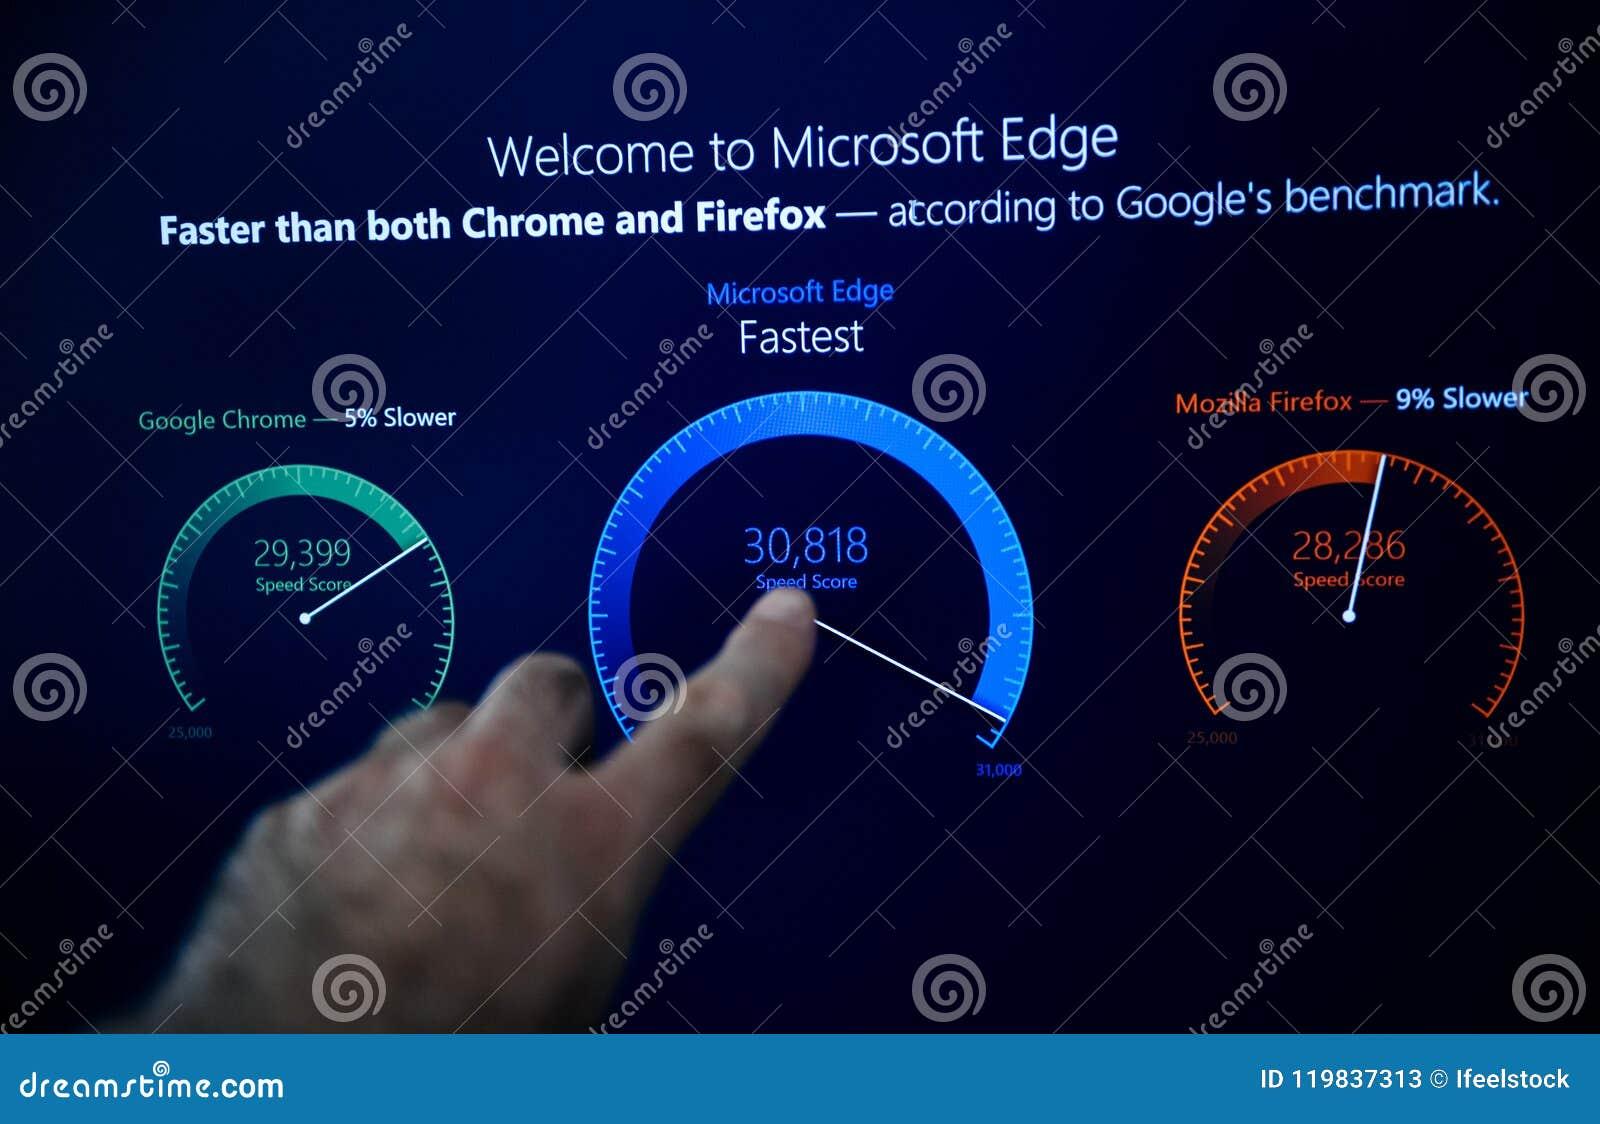 microsoft edge download windows 10 pro